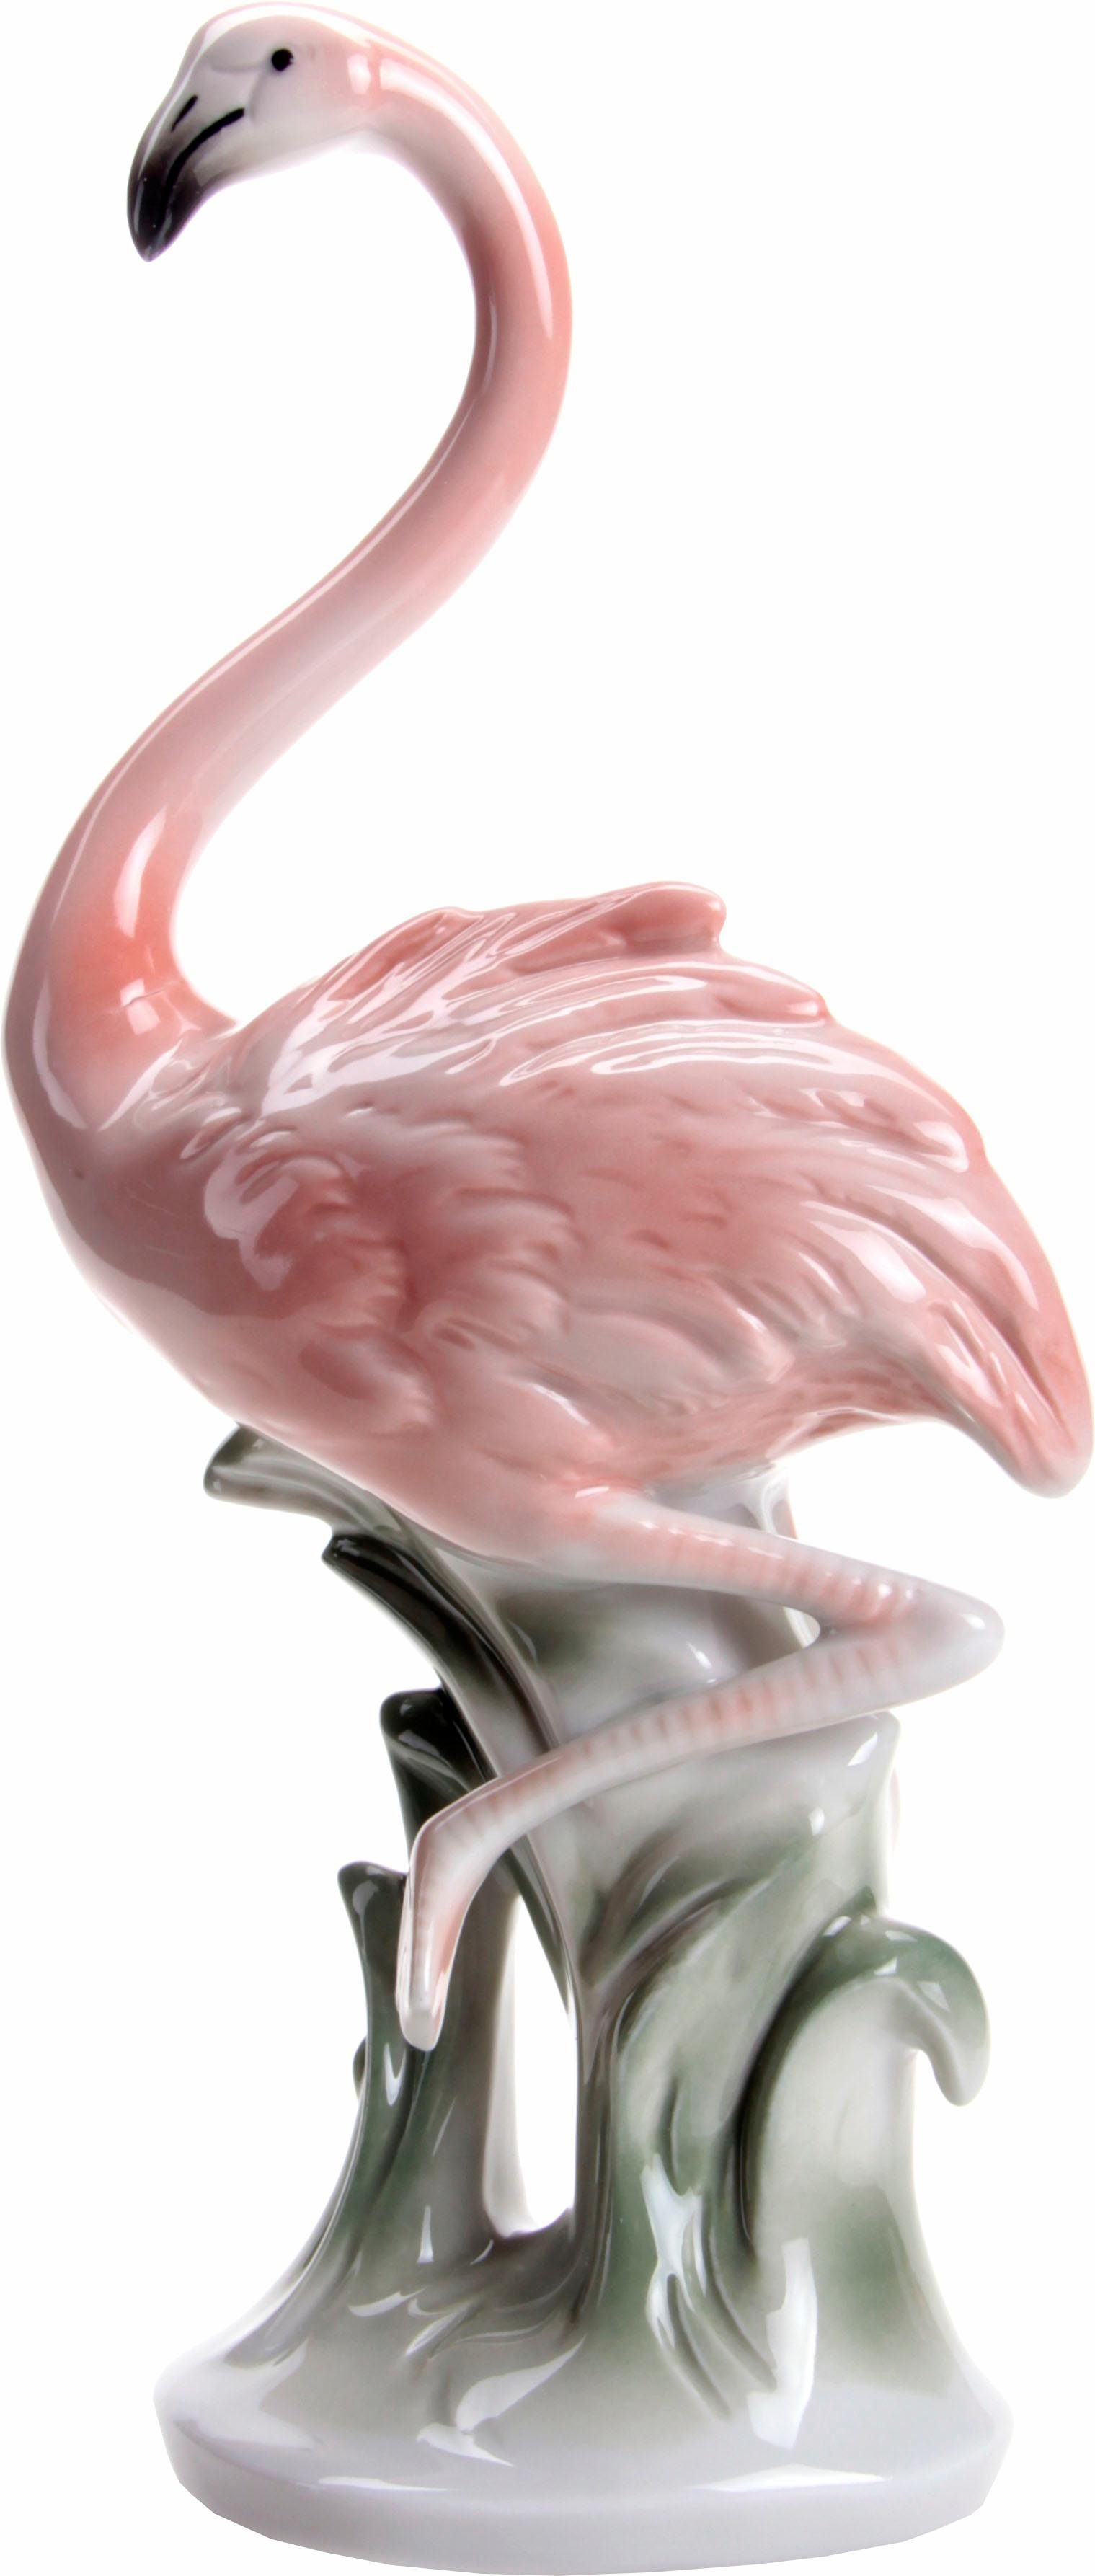 Wagner & Apel Figur »Flamingo« aus Porzellan